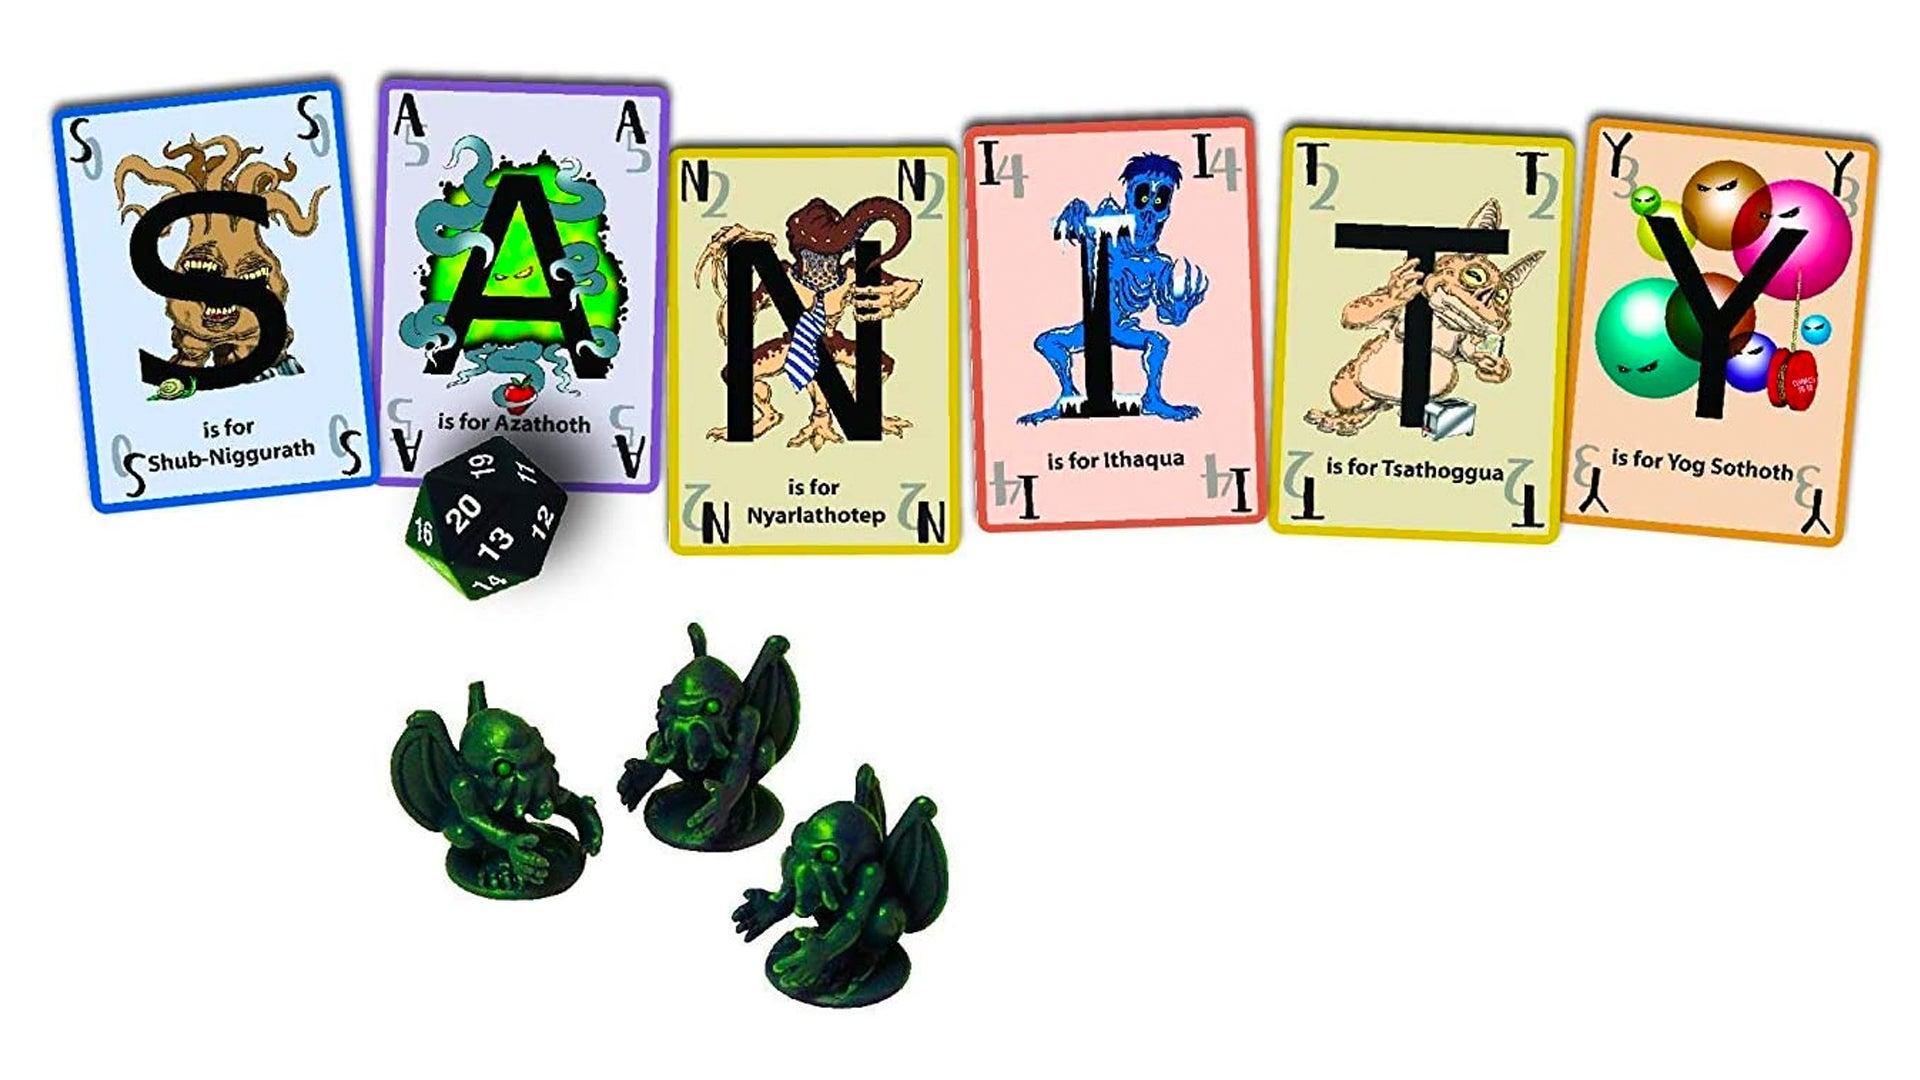 unspeakable-words-board-game-gameplay-cards-dice.jpg